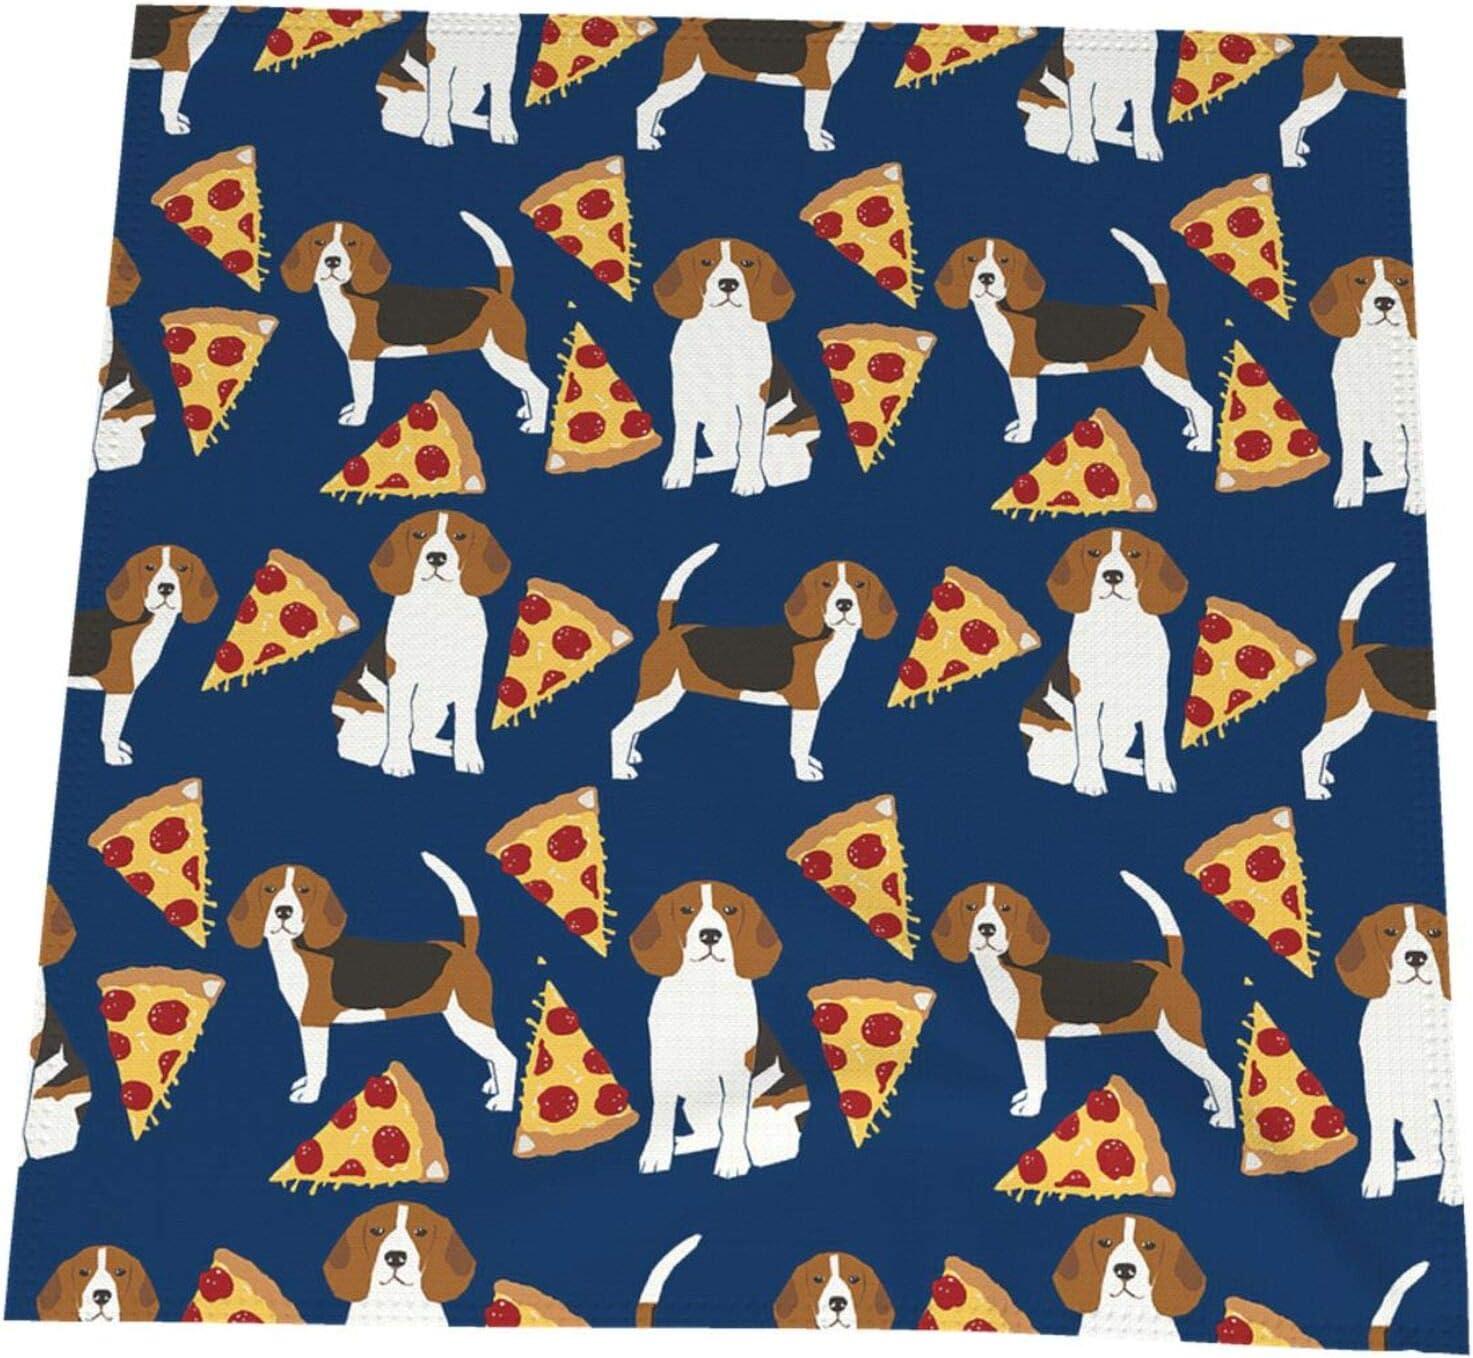 Pizza Food Beagle Dog Cute Animal Blue Napk Washable Deluxe Cloth Max 79% OFF 19x19